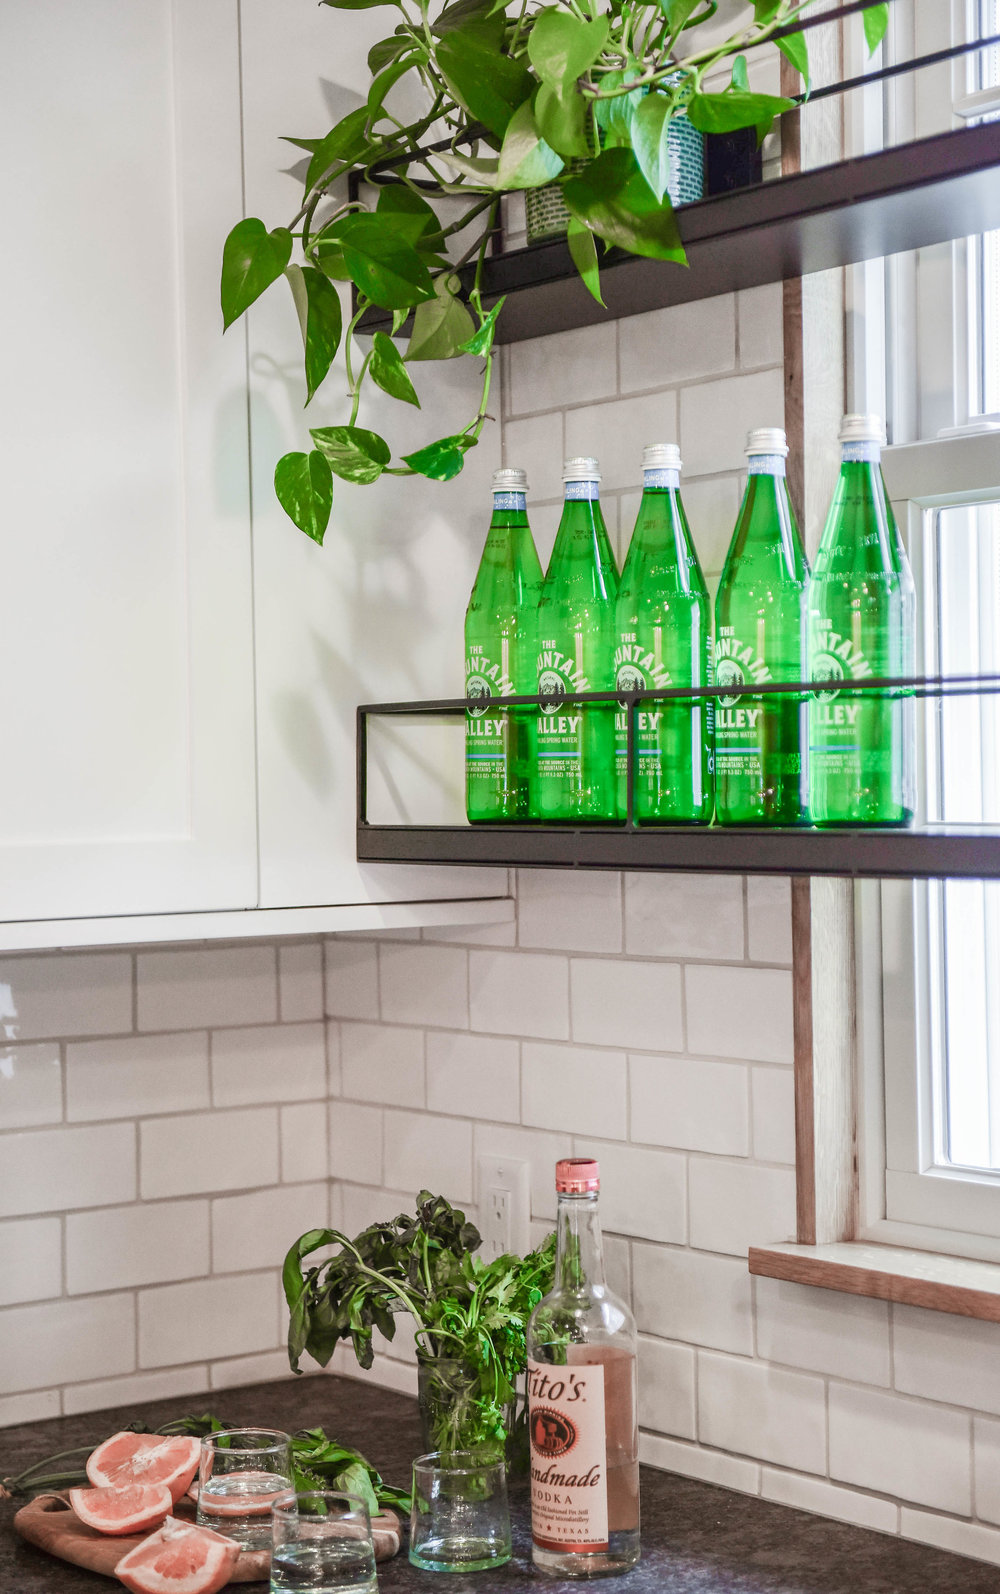 metal shelves in kitchen.jpg